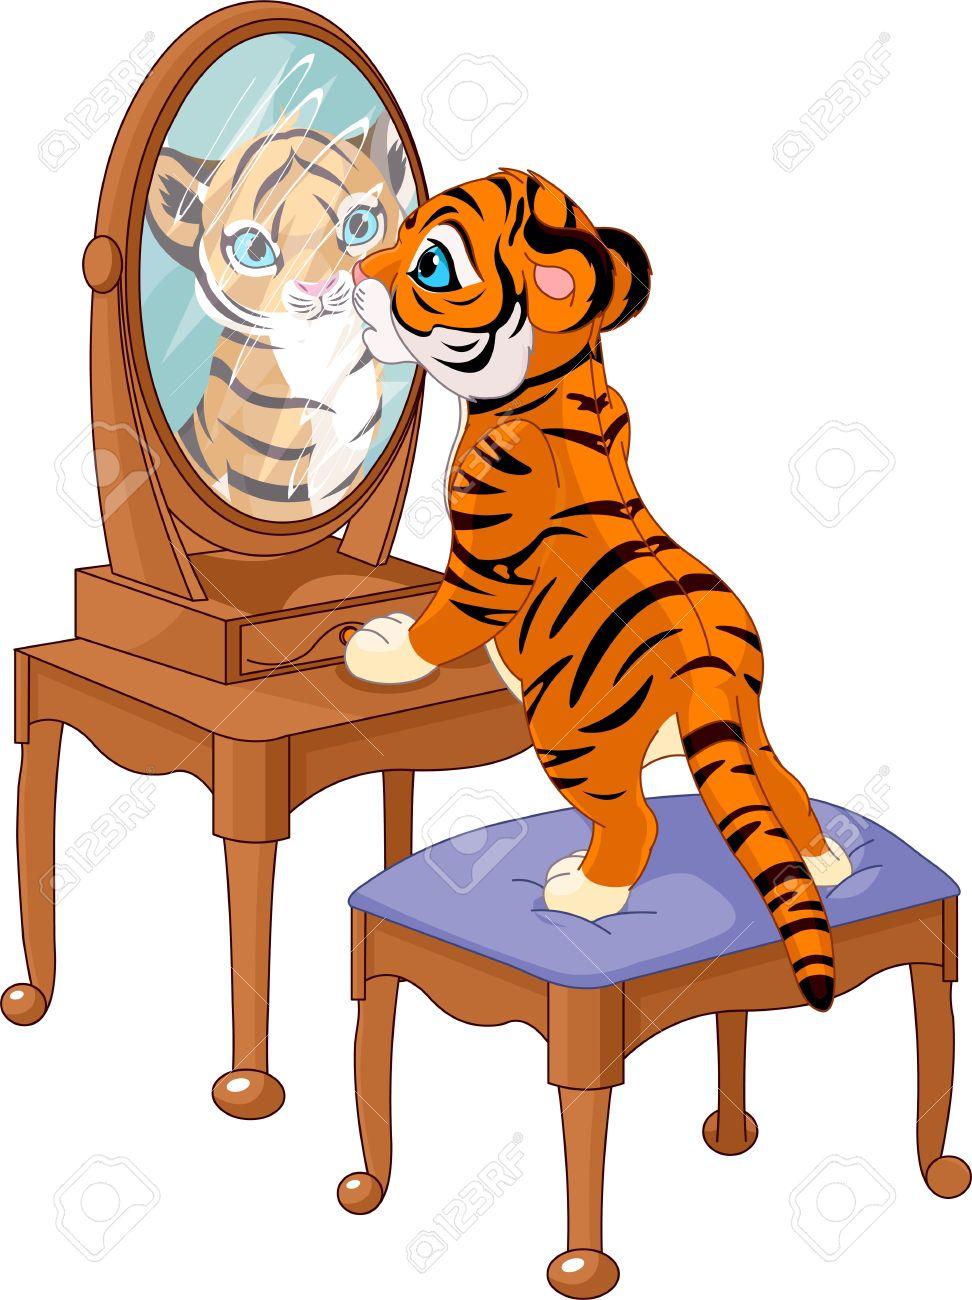 Cute tiger cub looking in the mirror Stock Vector - 13759239